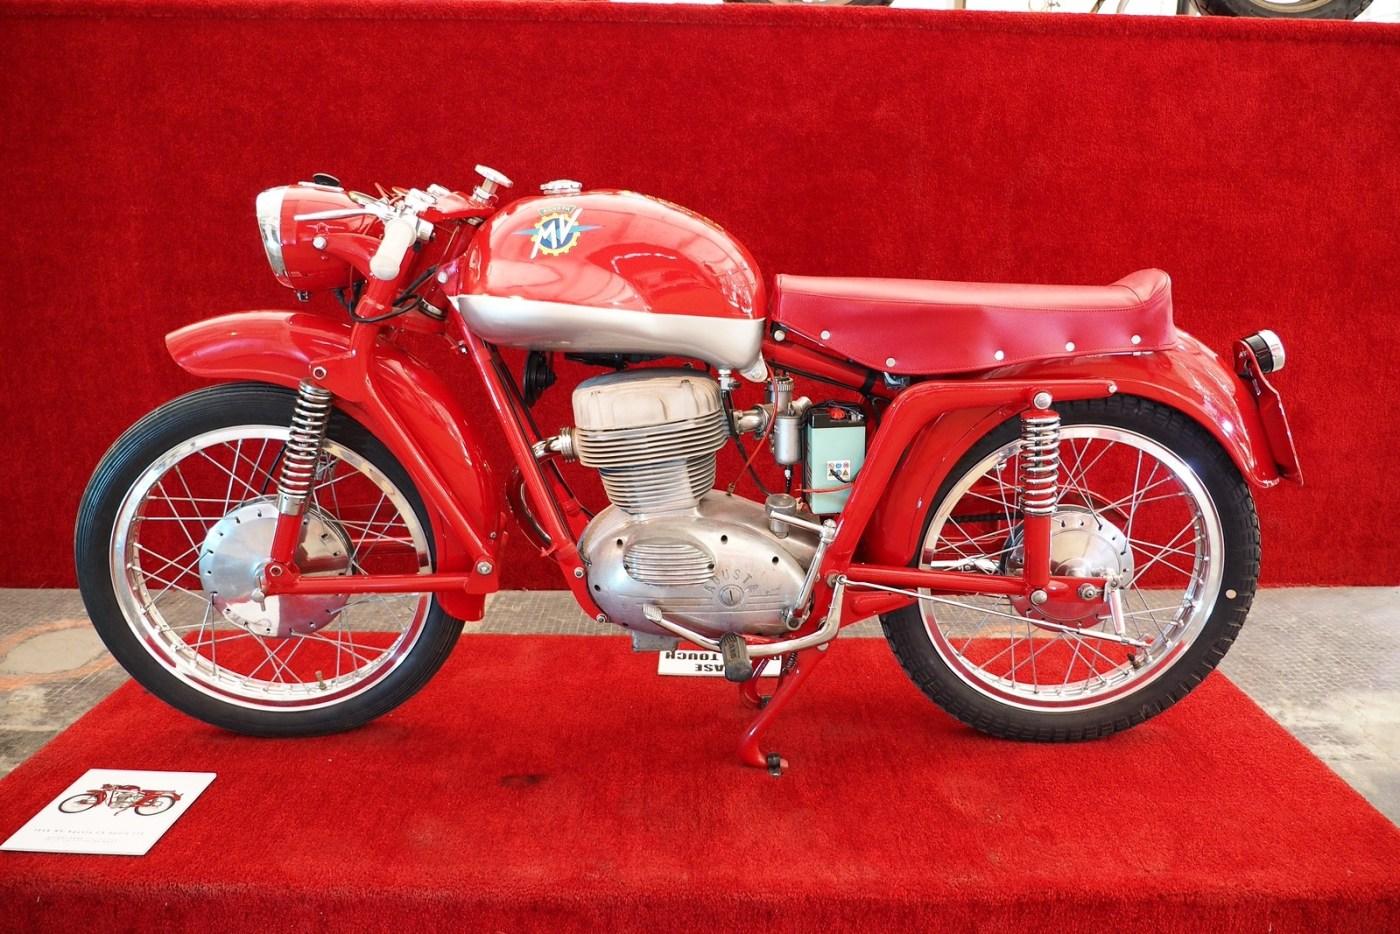 The Art of the Italian Two Wheel